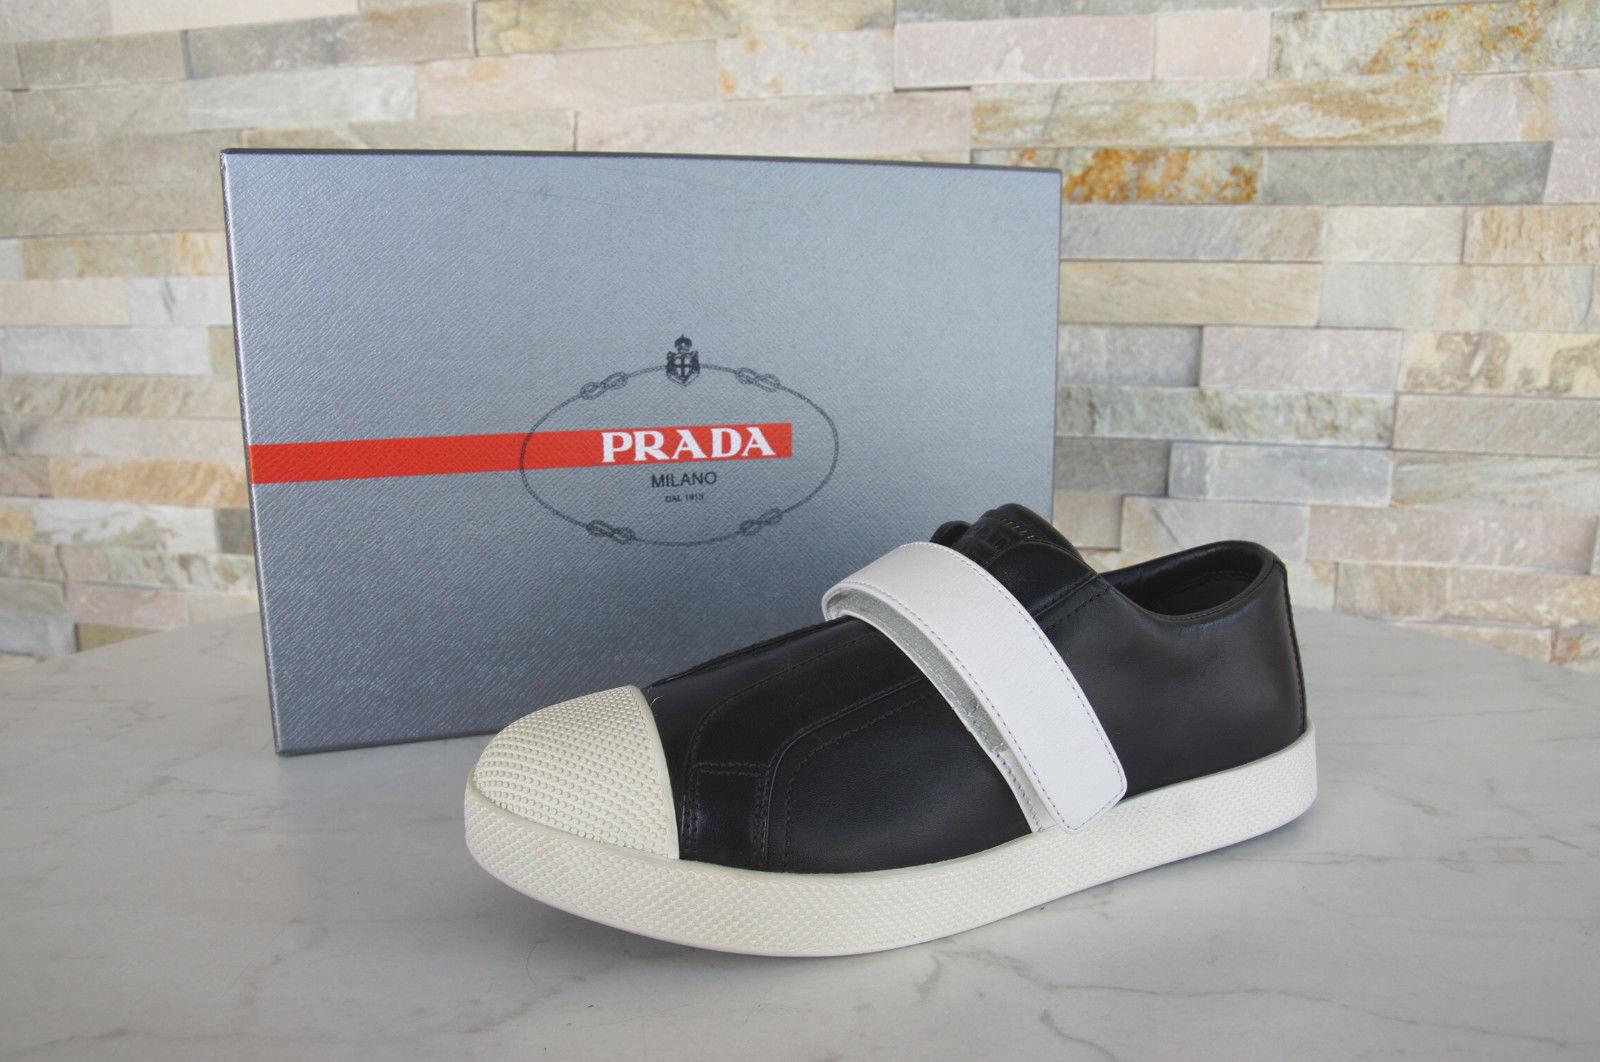 Prada Gr 3E6274 36,5 Sneakers Slipper Schuhe 3E6274 Gr schwarz Leder NEU 8e228c